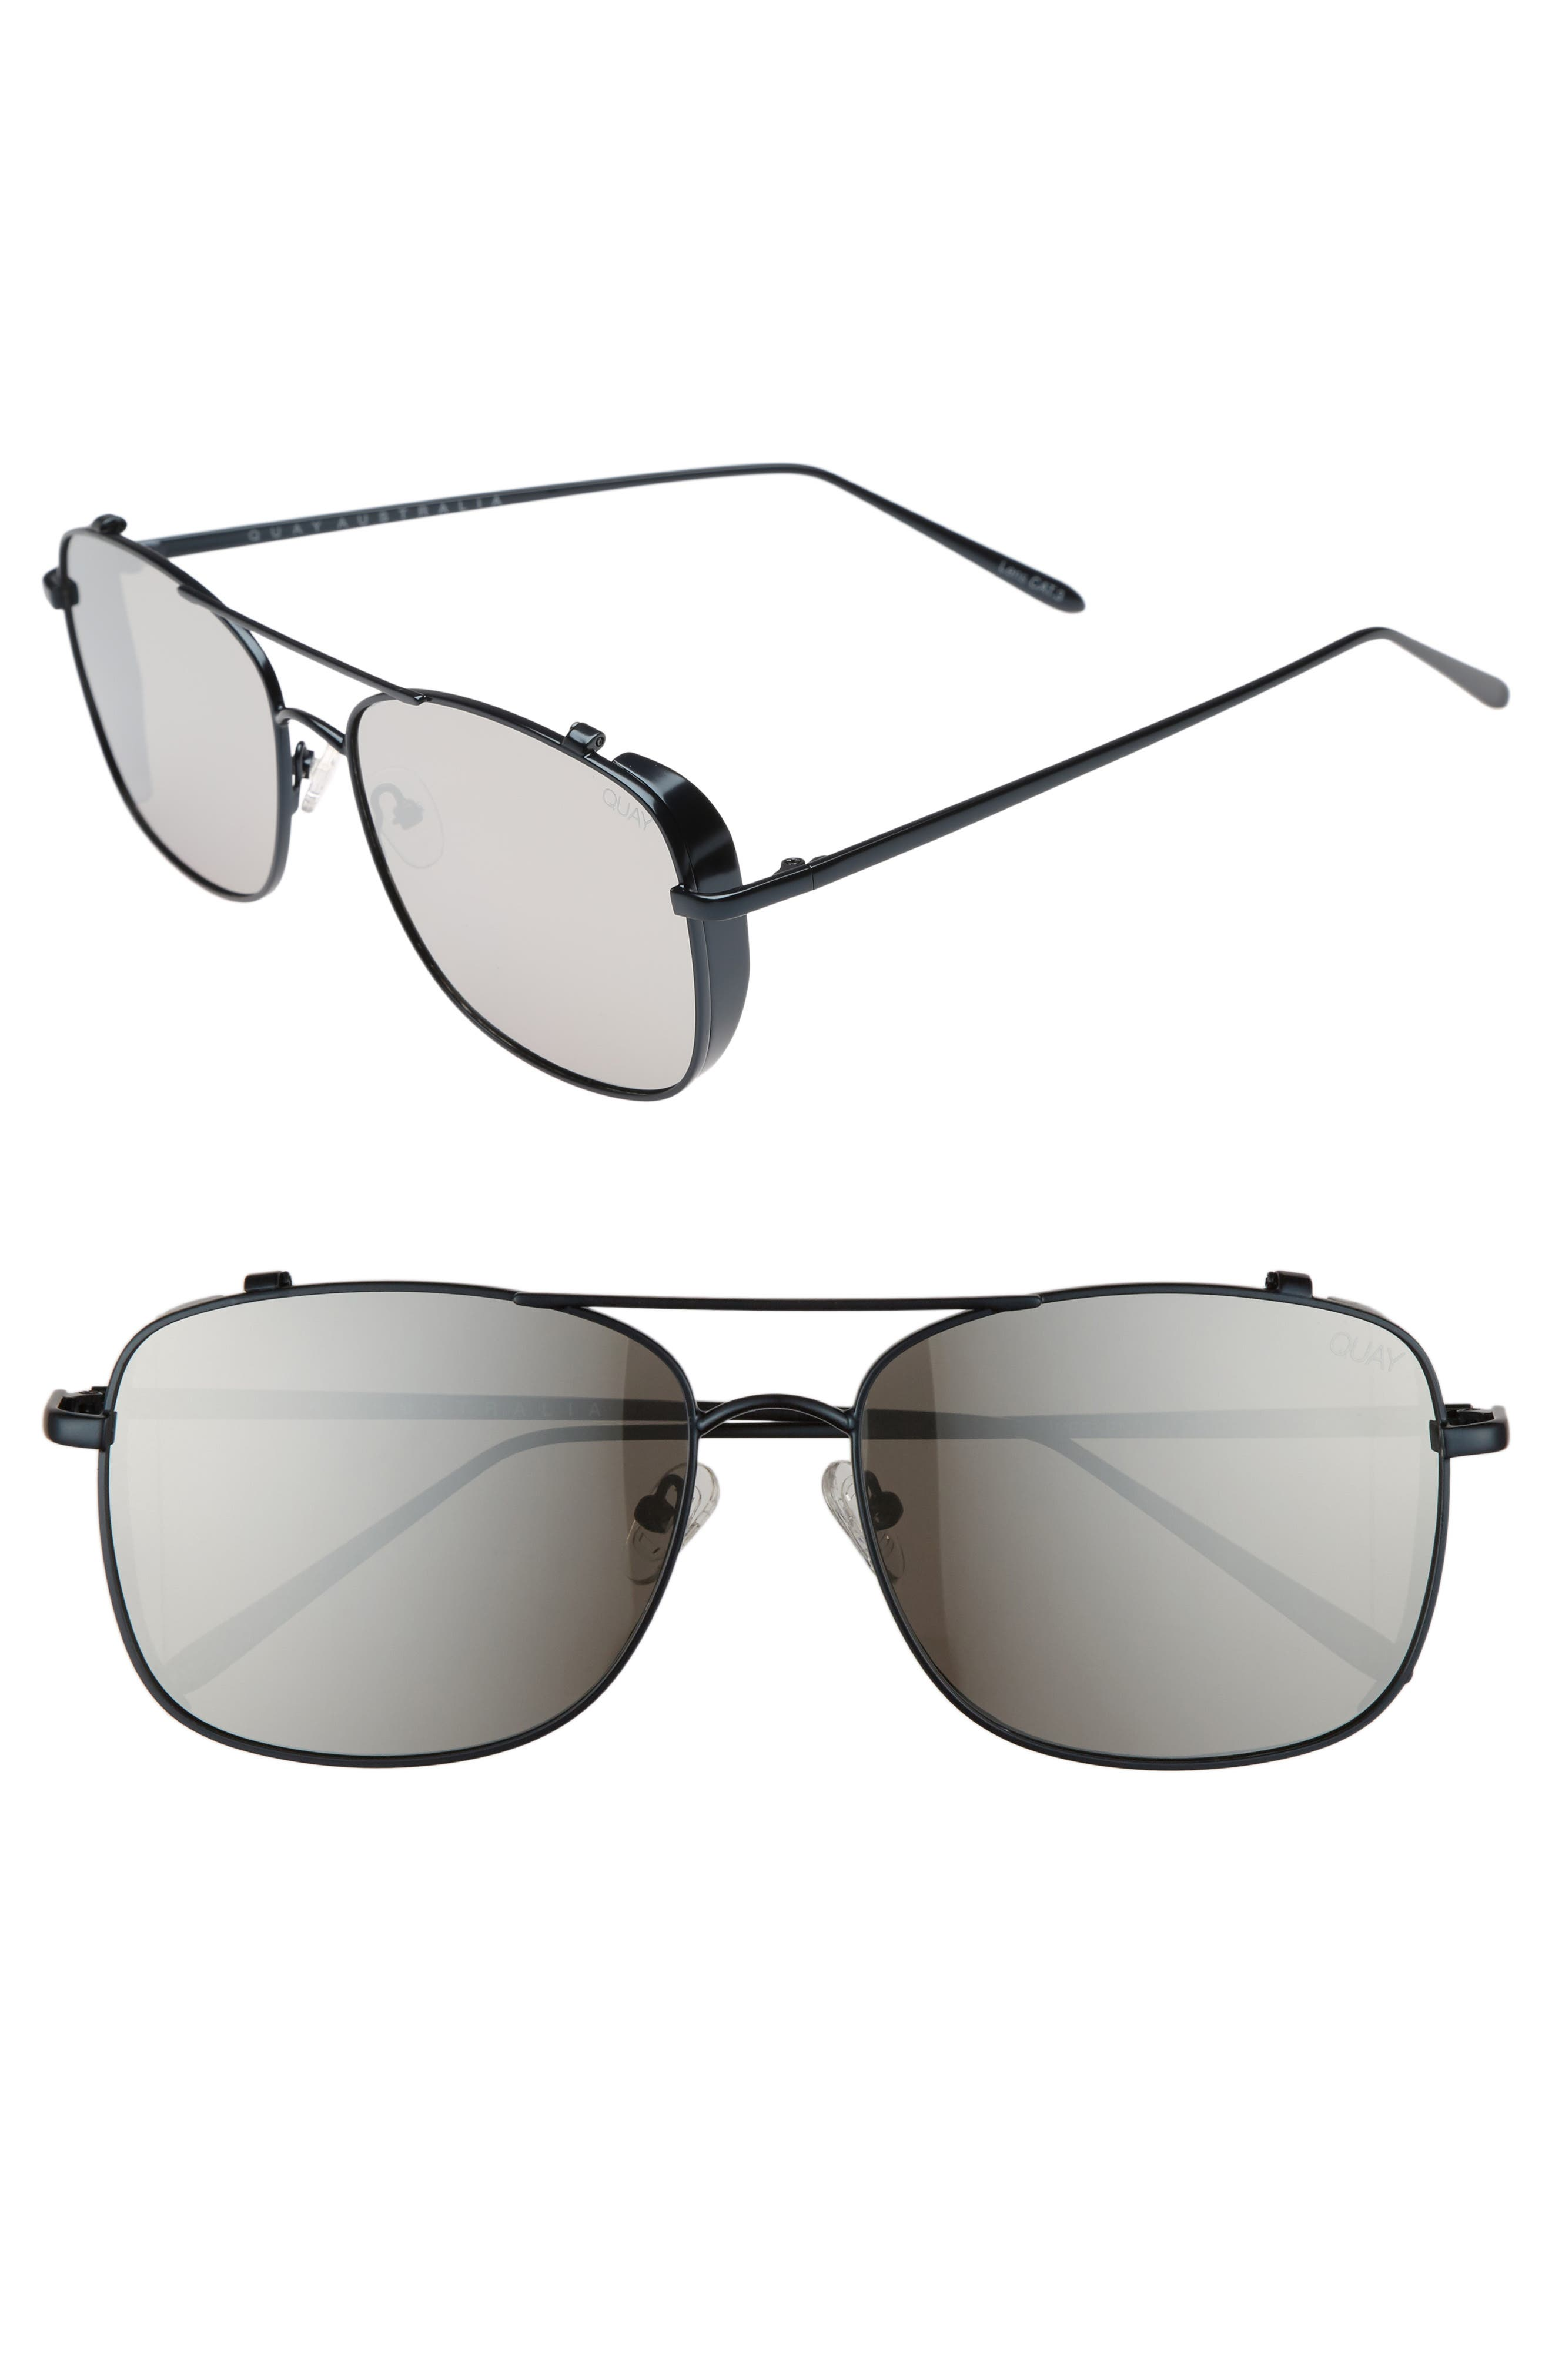 Weekend Warrior 60mm Navigator Sunglasses,                             Main thumbnail 1, color,                             NAVY/ SILVER